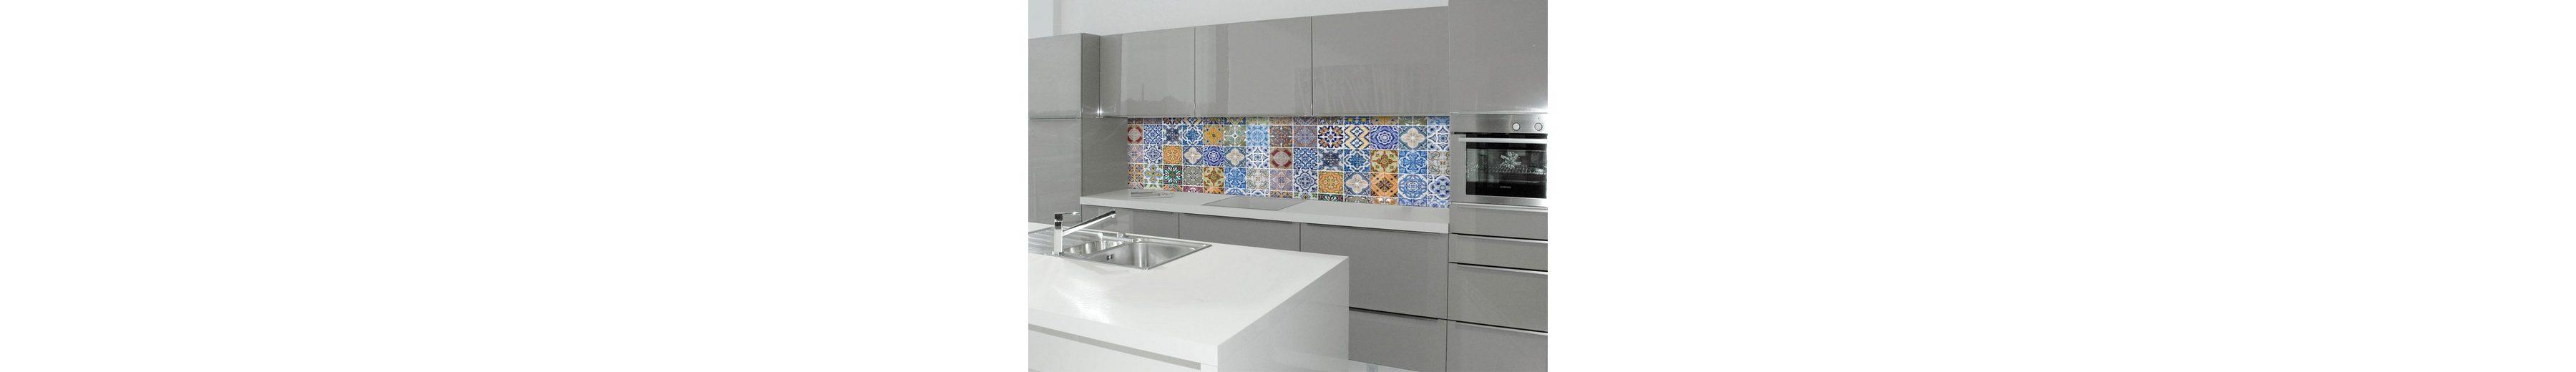 Küchenrückwand - Spritzschutz »profix«, Pablo Fliese, 220x60 cm